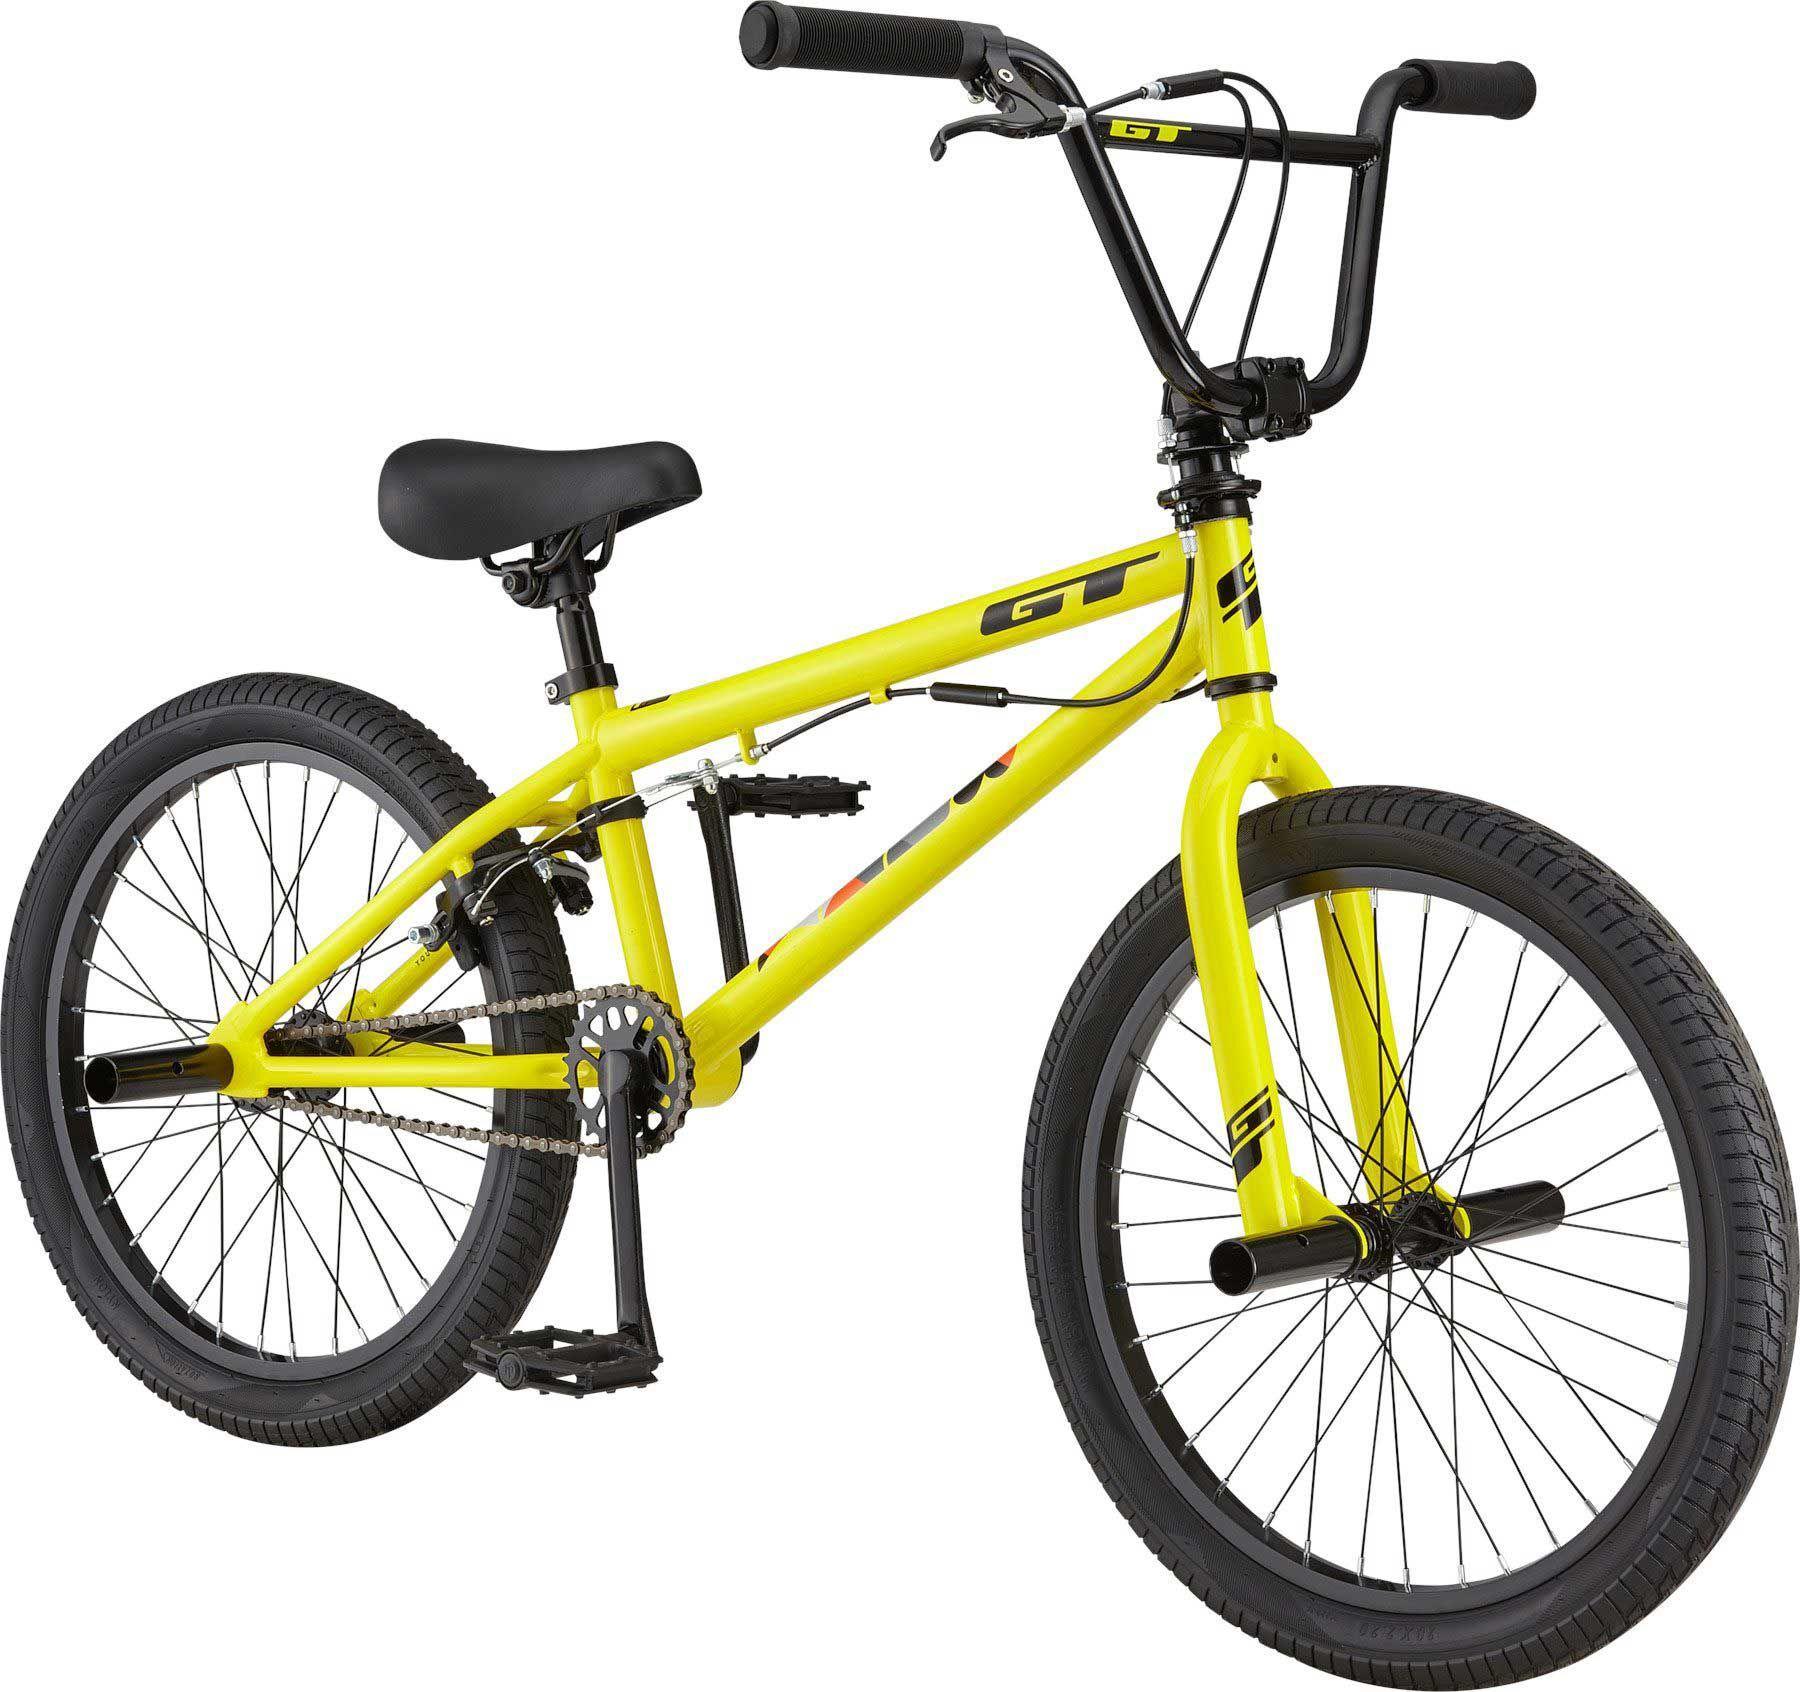 GT Kids' Bank BMX Bike, 20 IN., Yellow